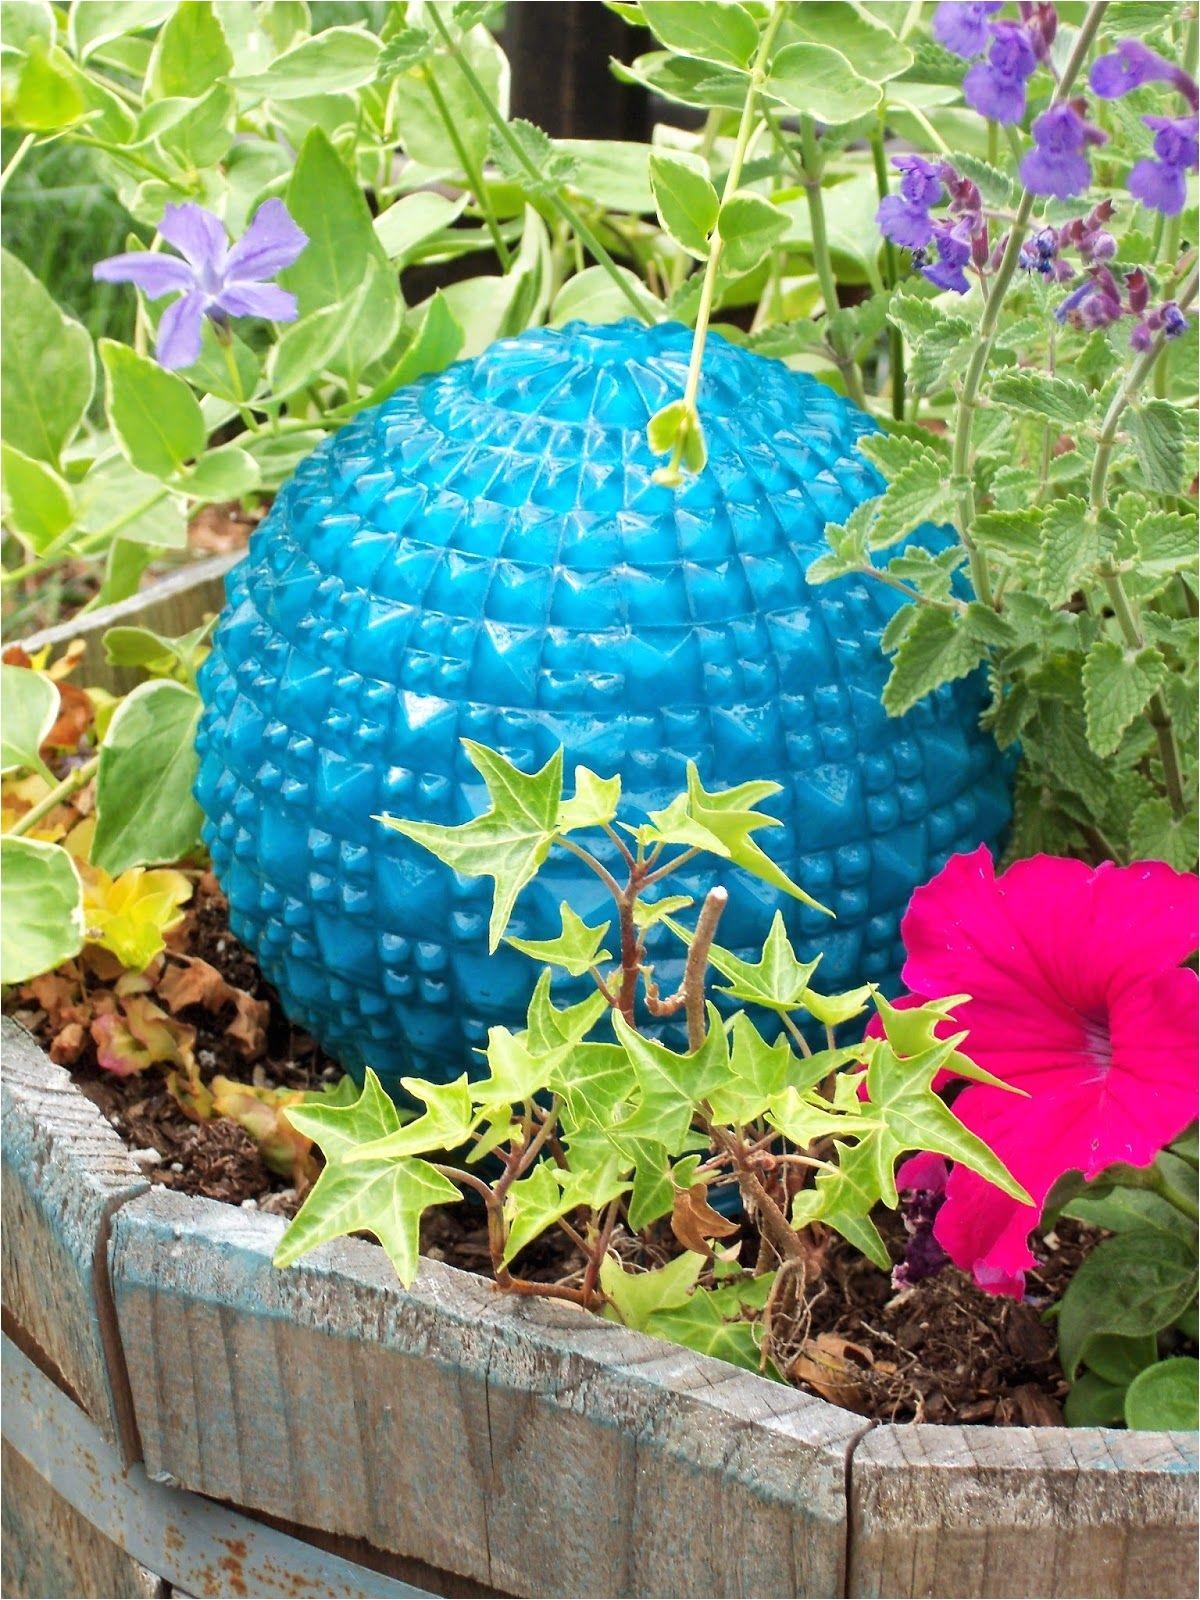 make the best of things diy garden art super easy glass garden balls from lamp globes